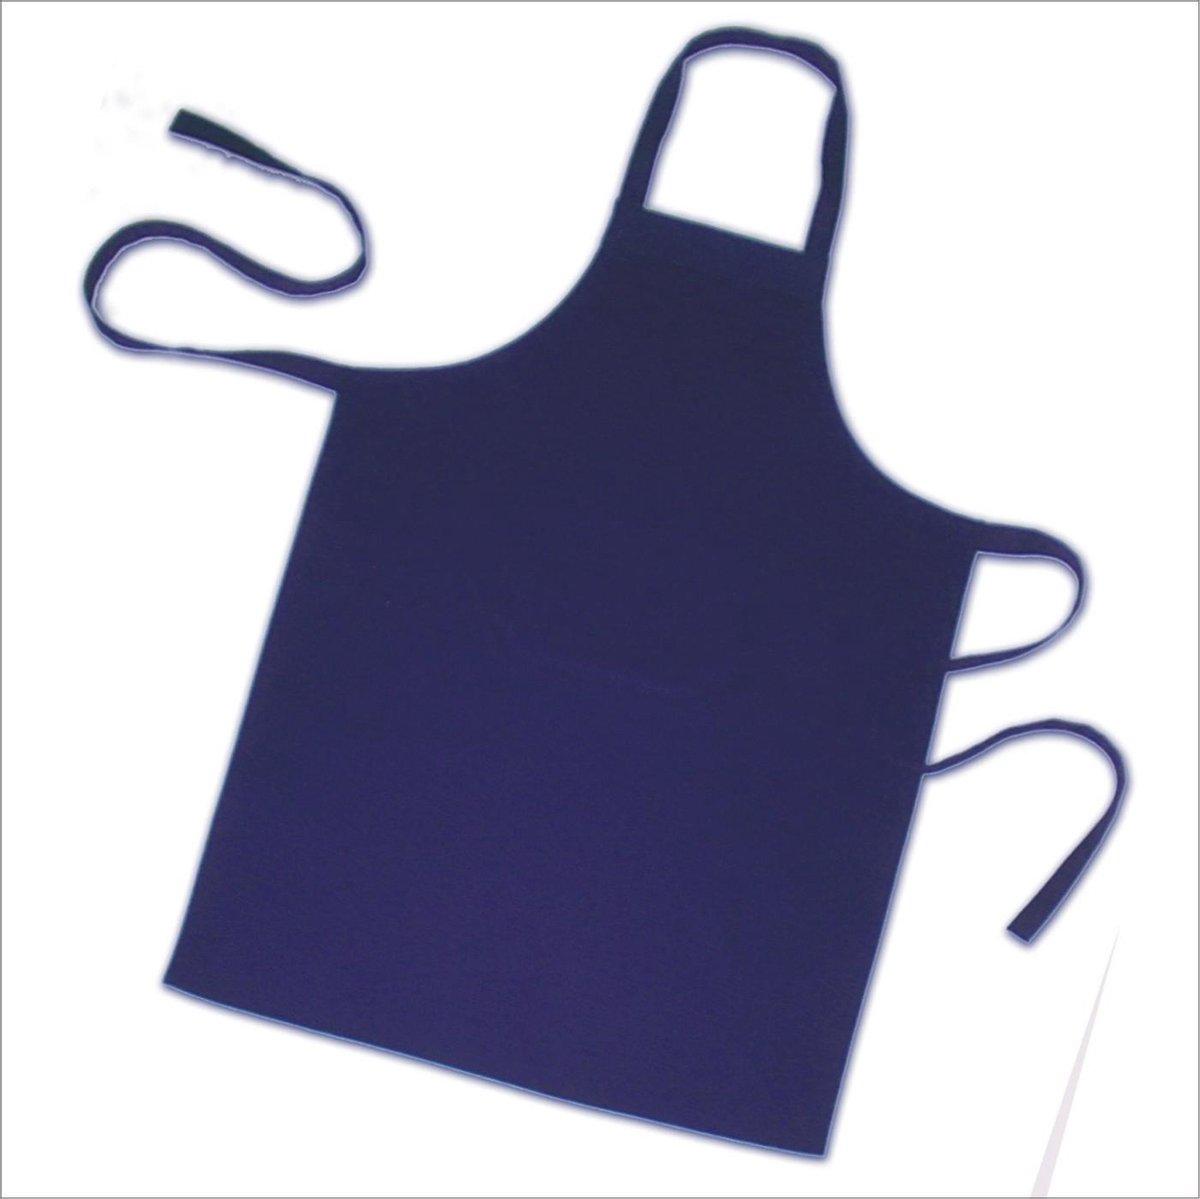 Homéé® Horeca suite Keukenschorten BBQ BIB Apron - marine blauw - 70x100 cm - 2 stuks